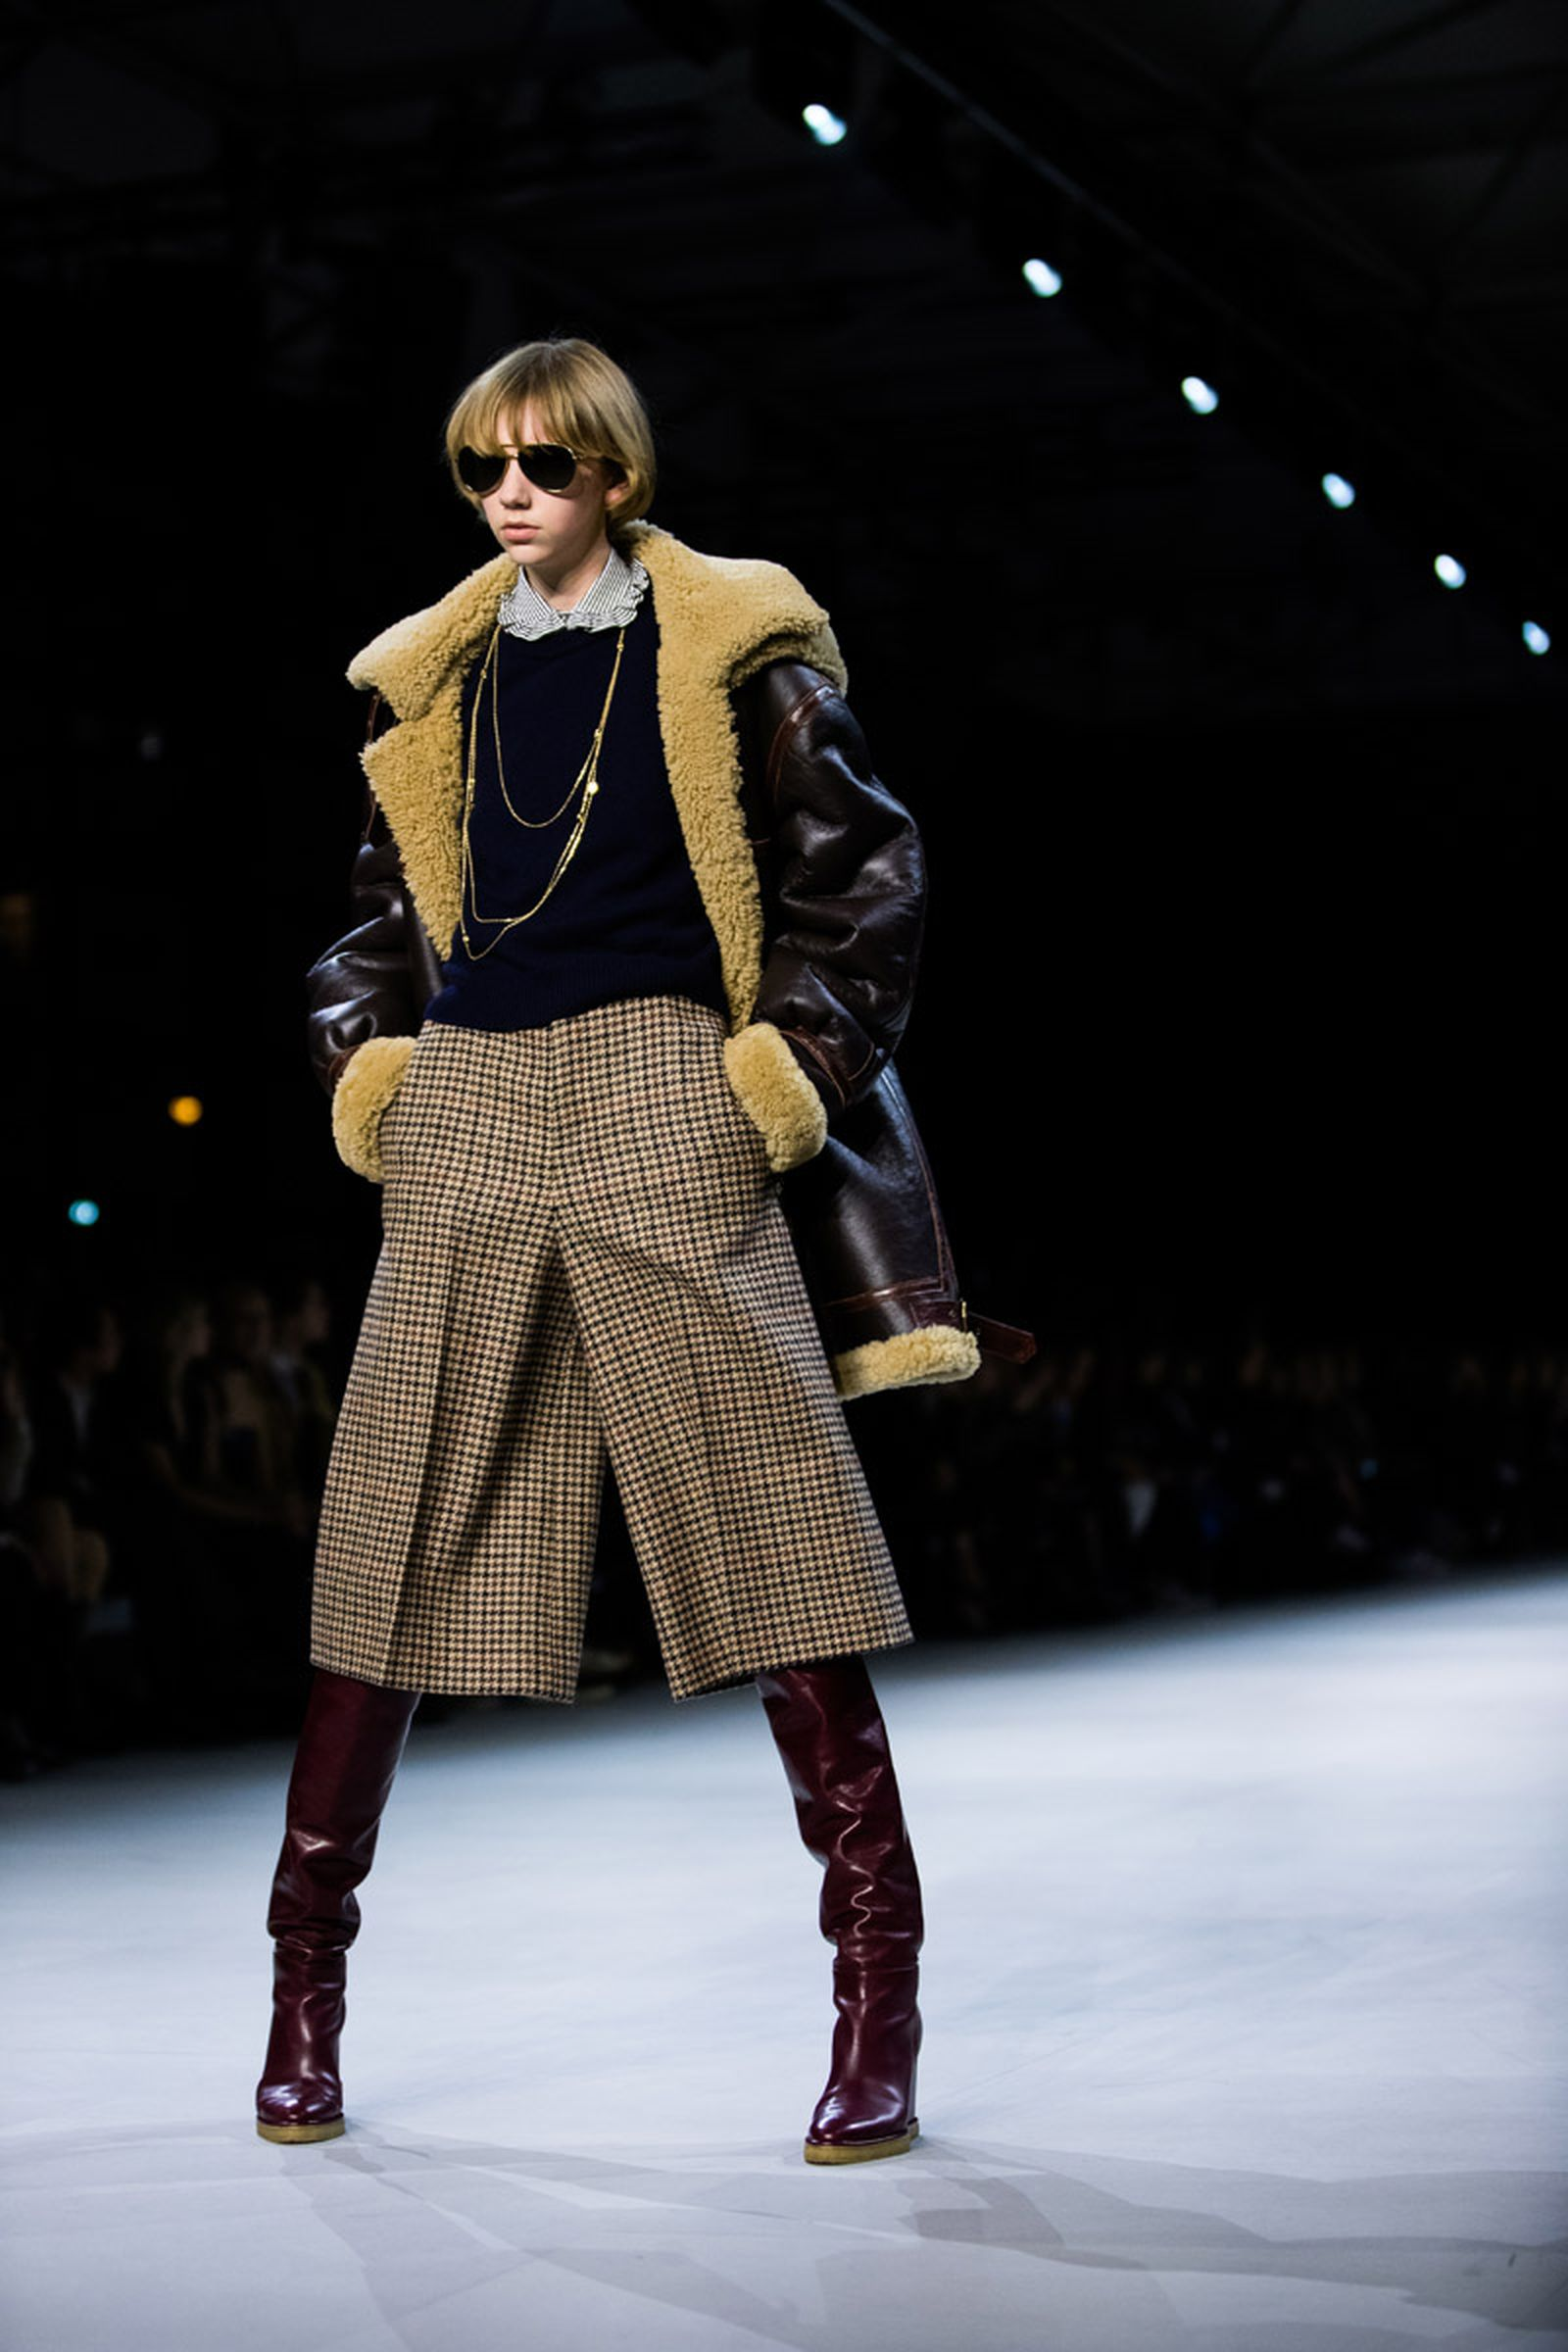 2celine fw19 womens paris fashion week